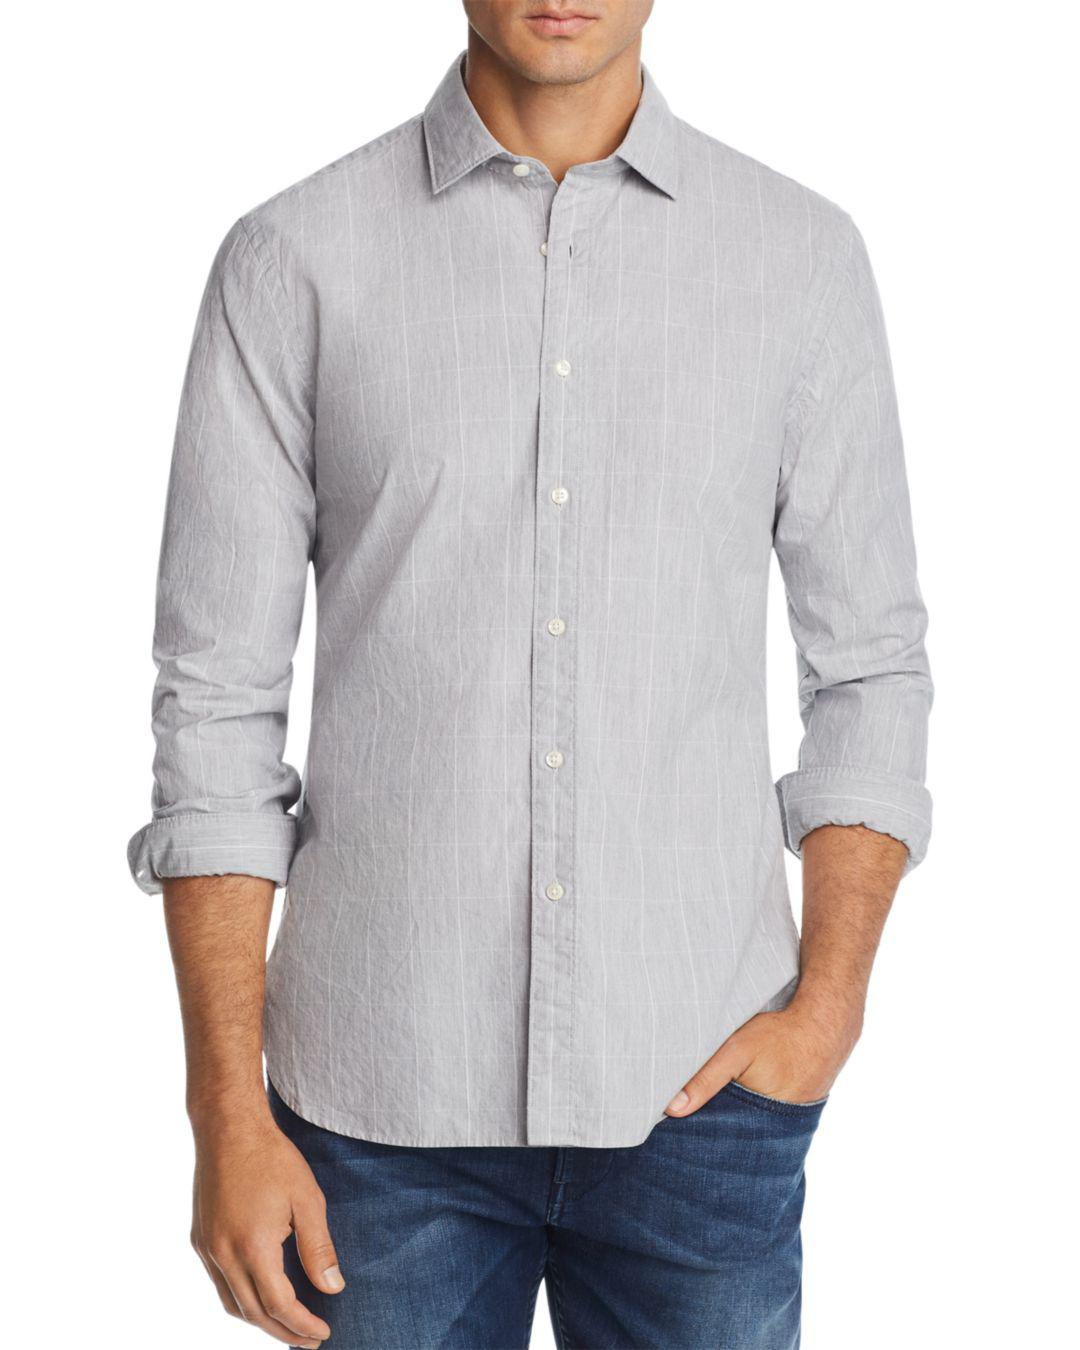 Bloomingdales Grid Print Broadcloth Slim Fit Shirt In Blue For Men